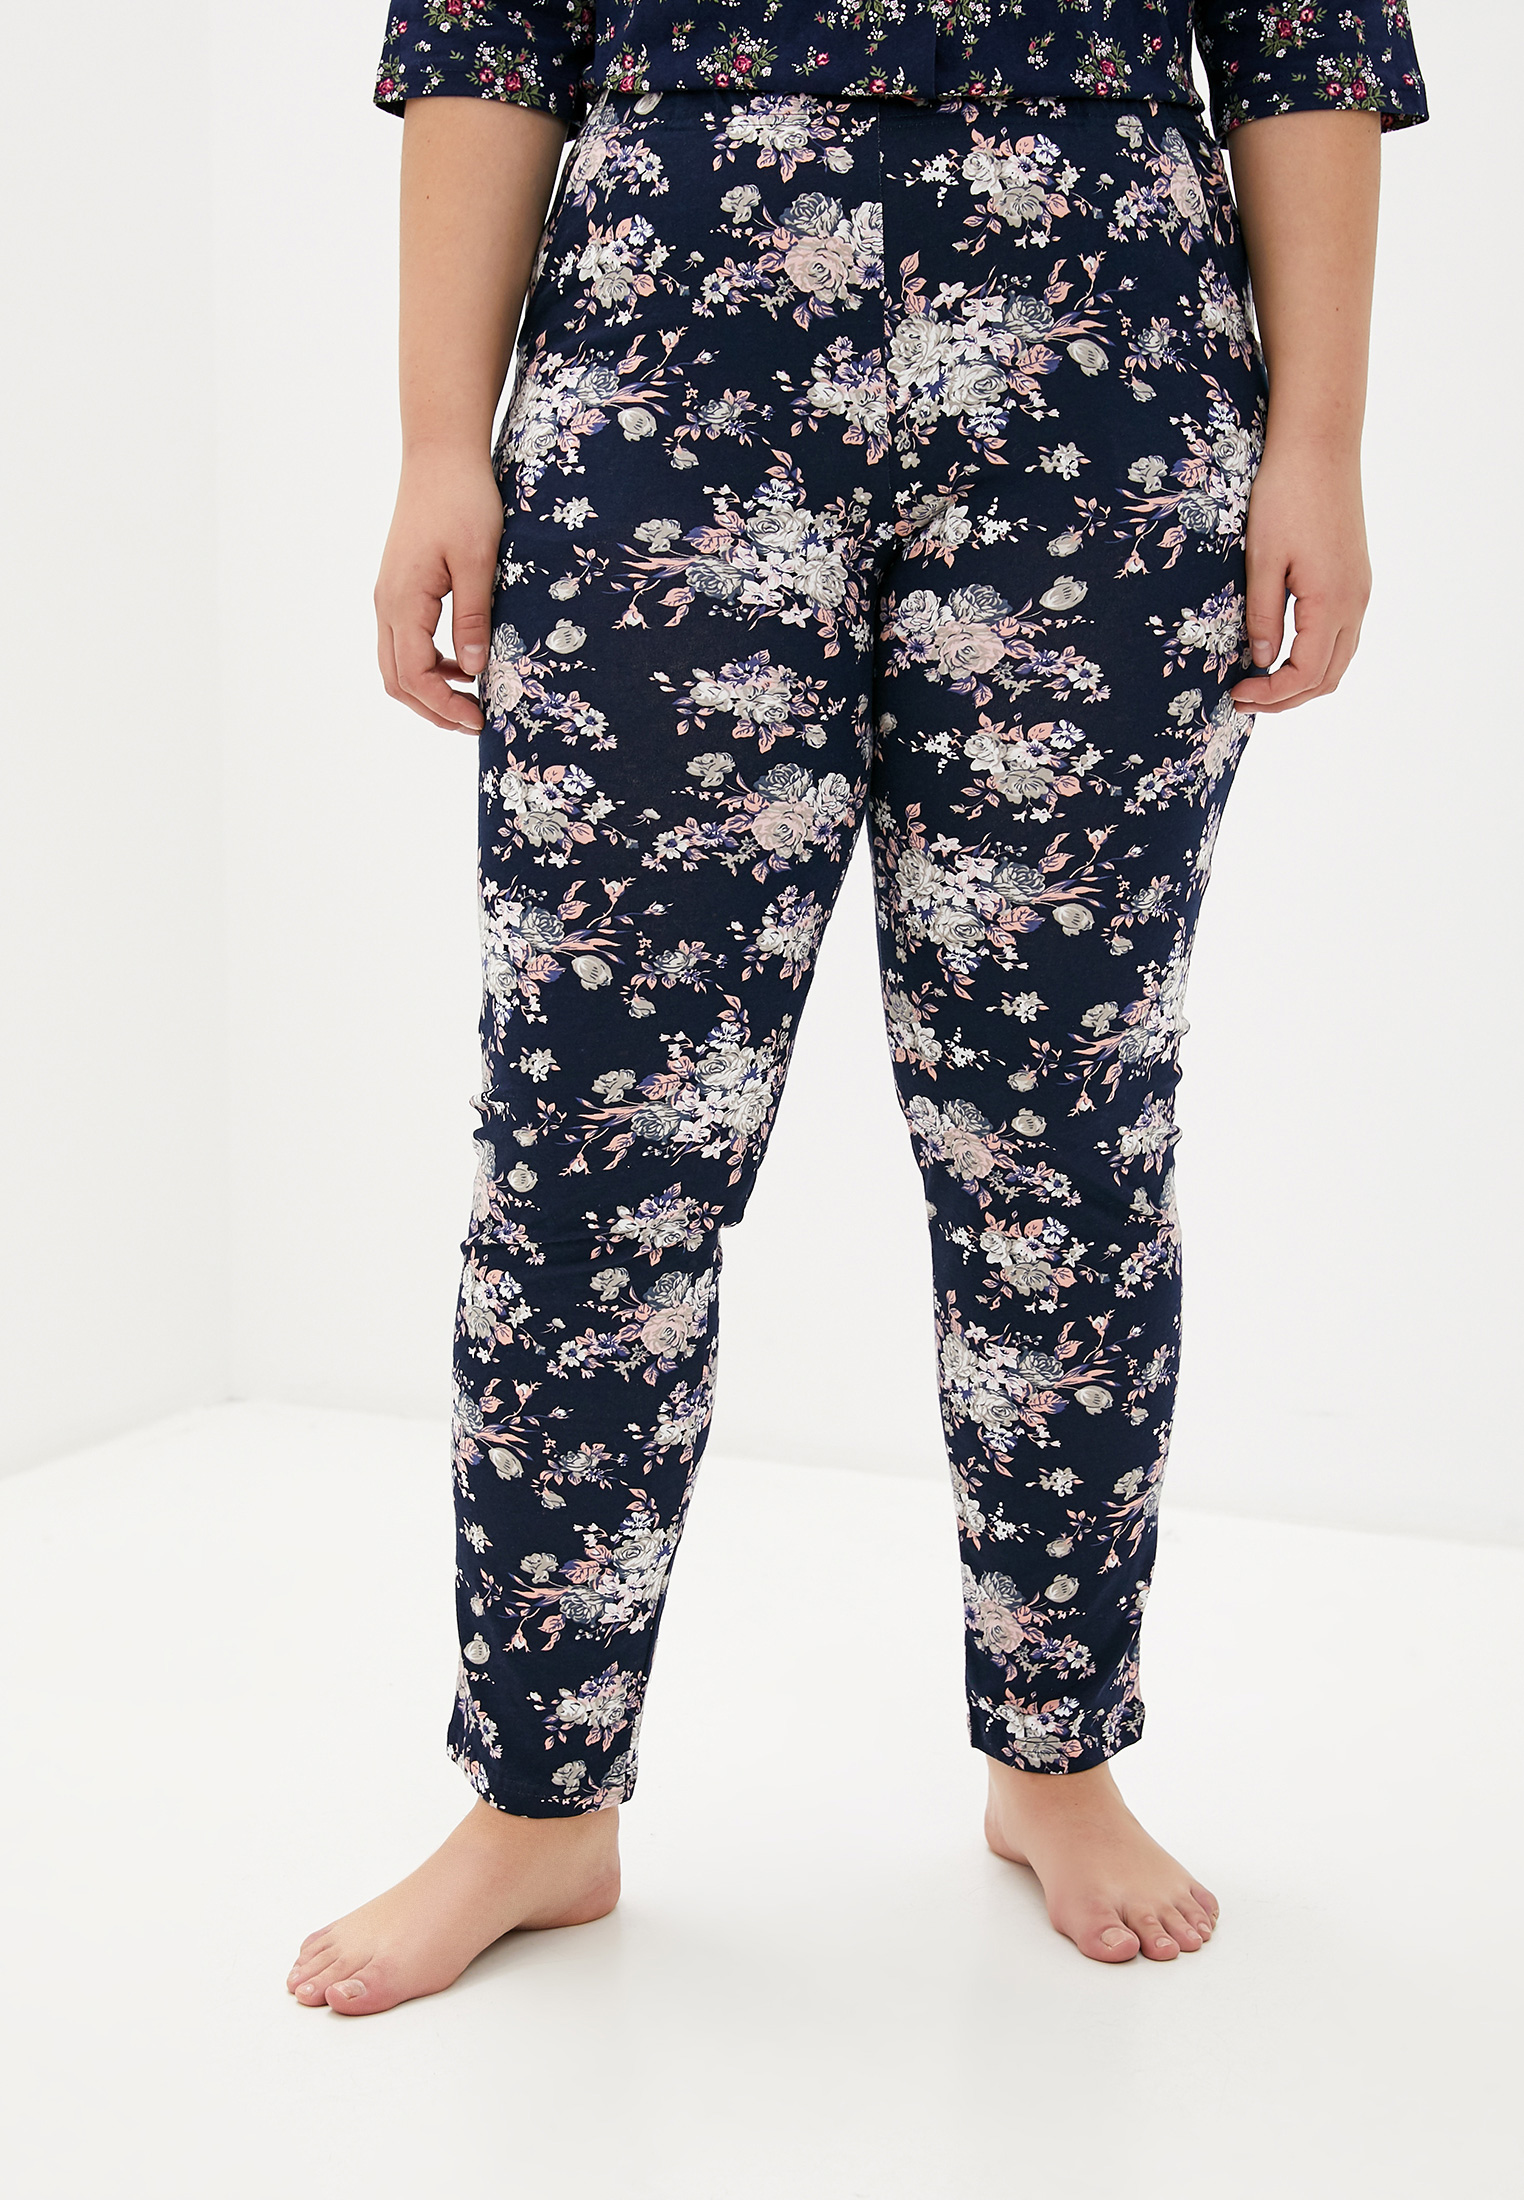 Женские домашние брюки Лори Б016-32